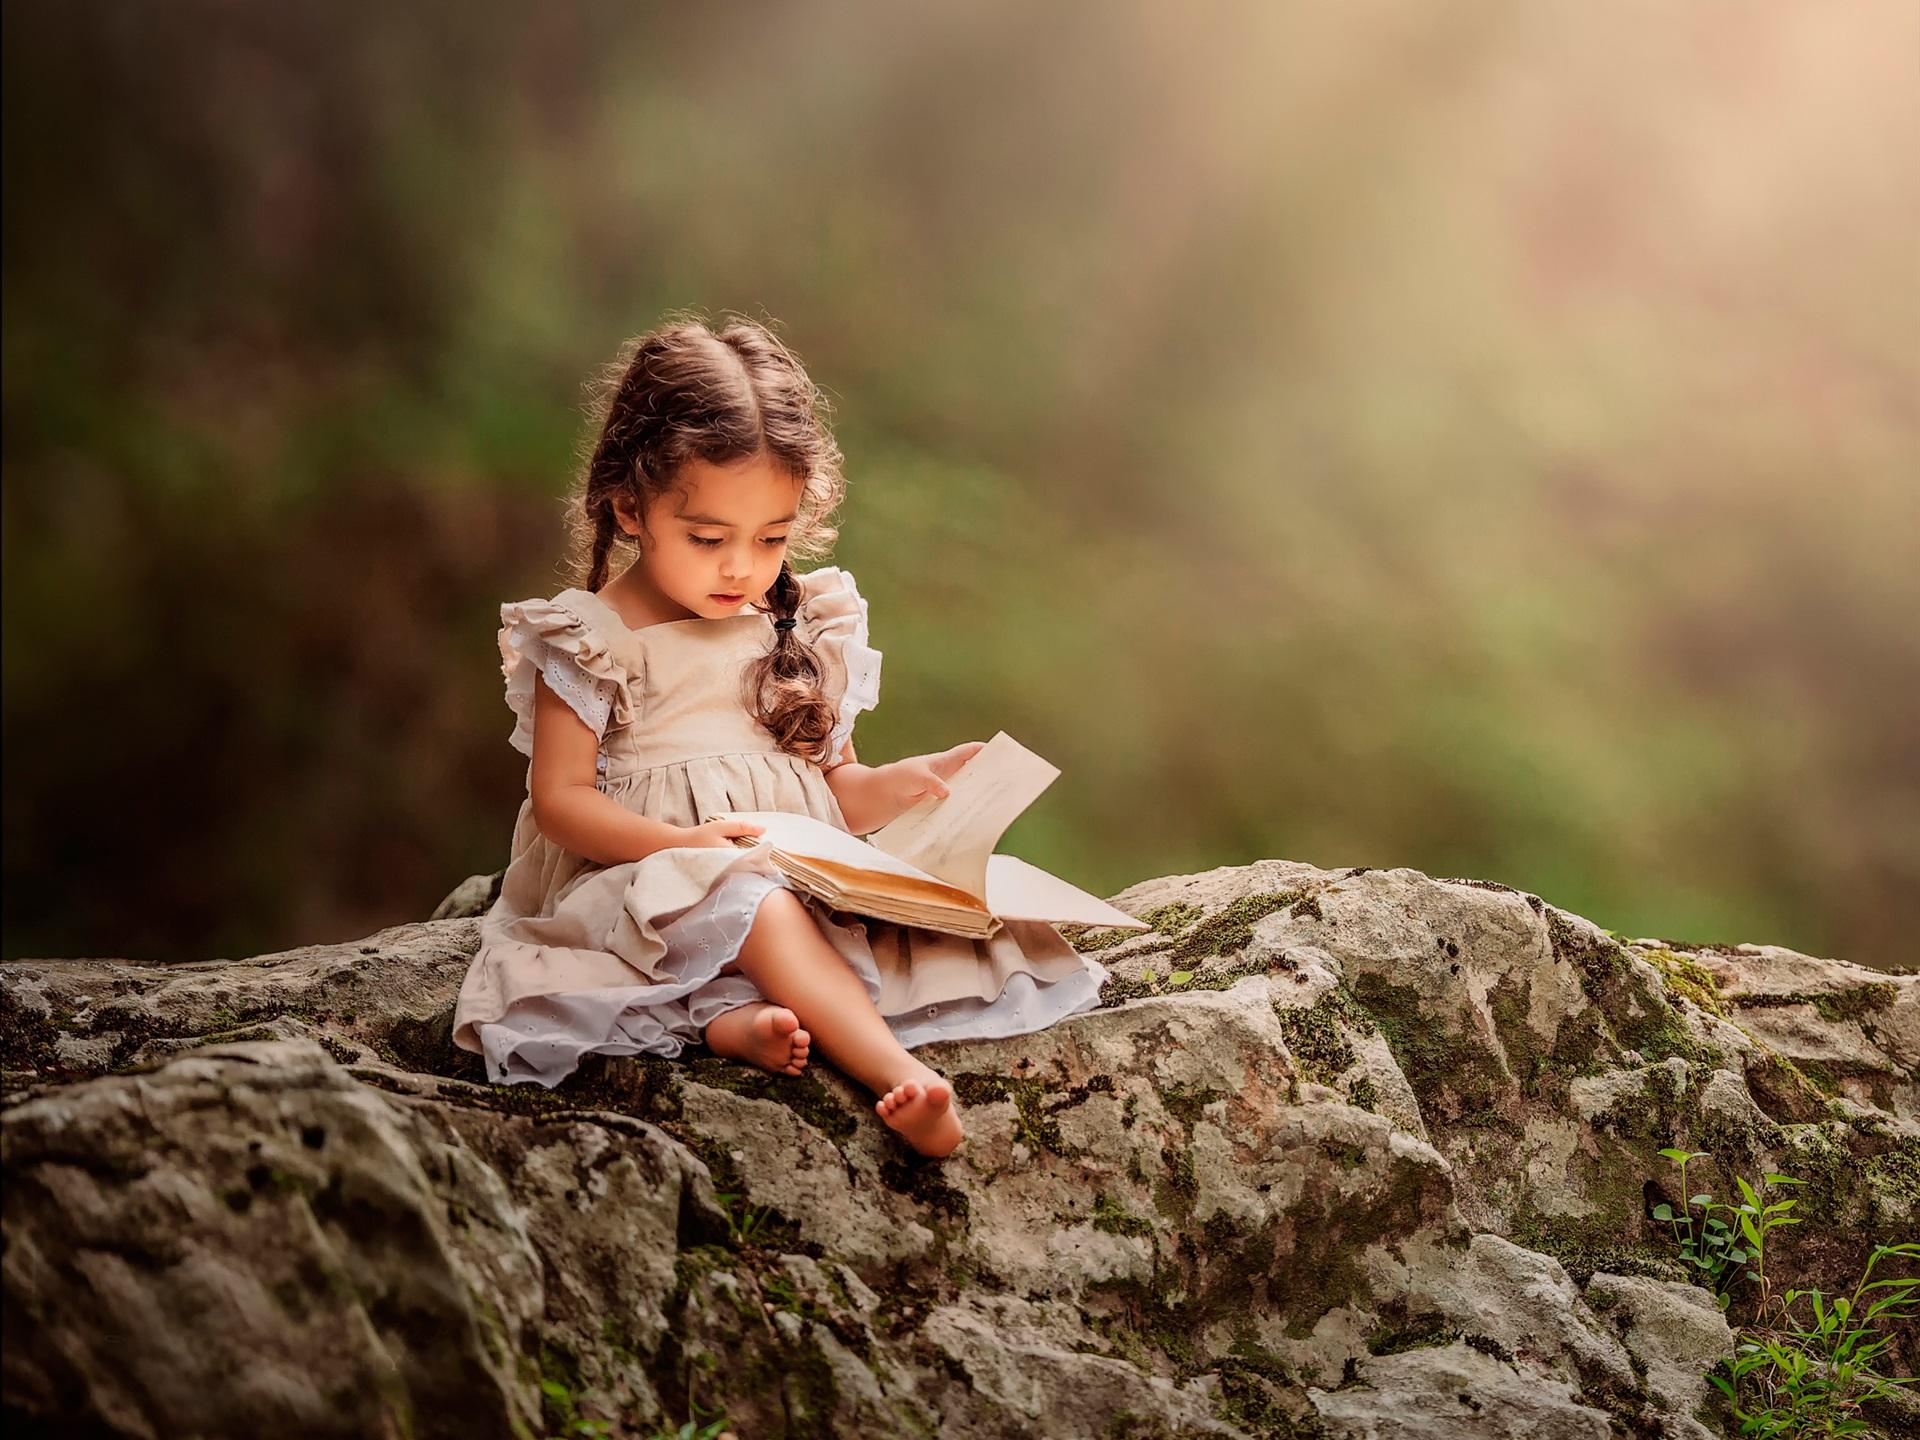 Wallpaper Lovely Little Girl Reading Book 1920x1440 Hd